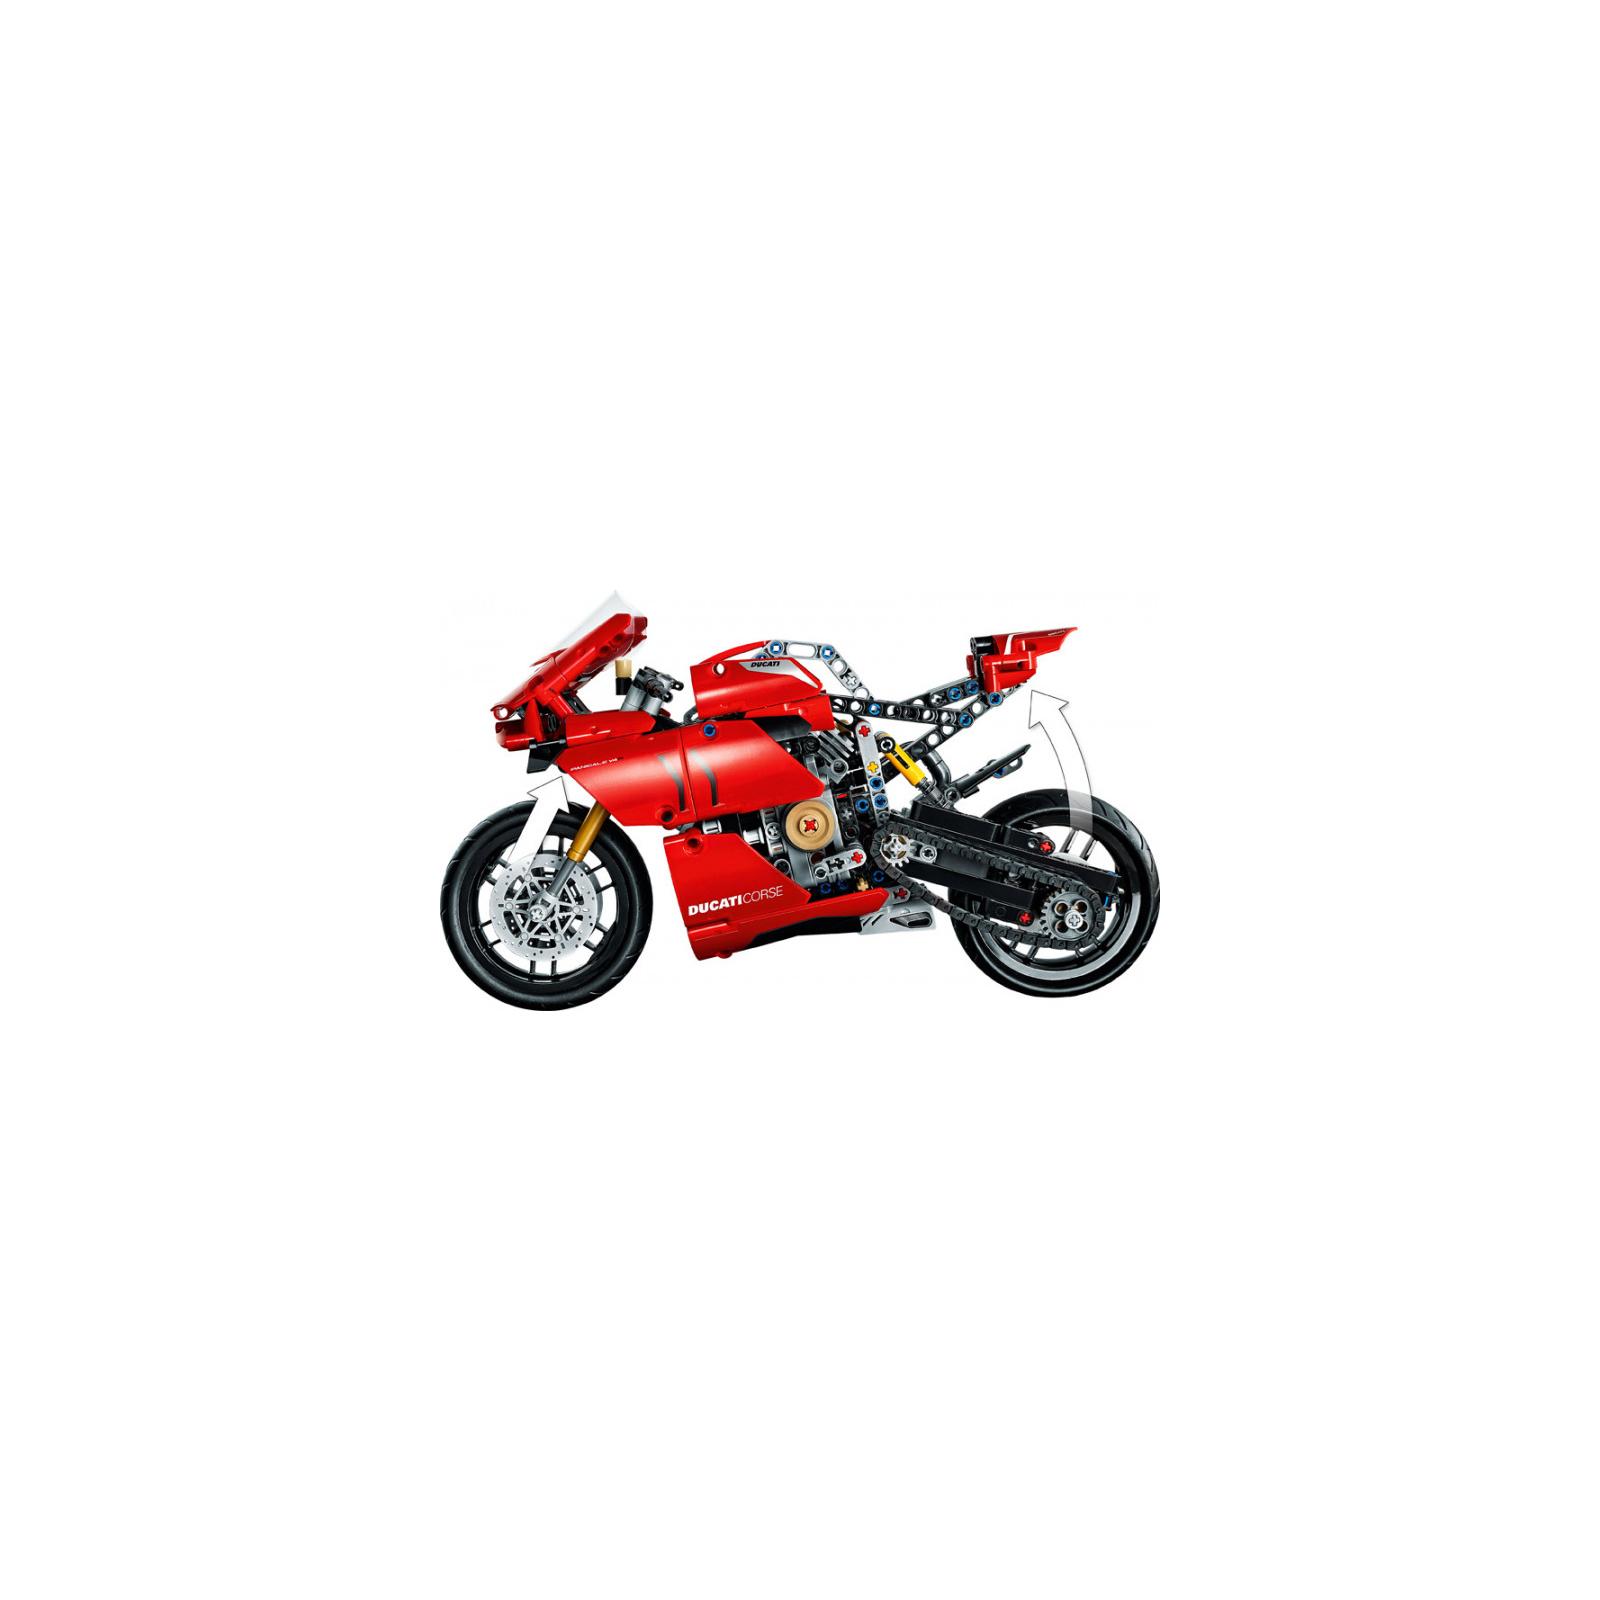 Конструктор LEGO Technic Ducati Panigale V4 R 0 646 детали (42107) изображение 3